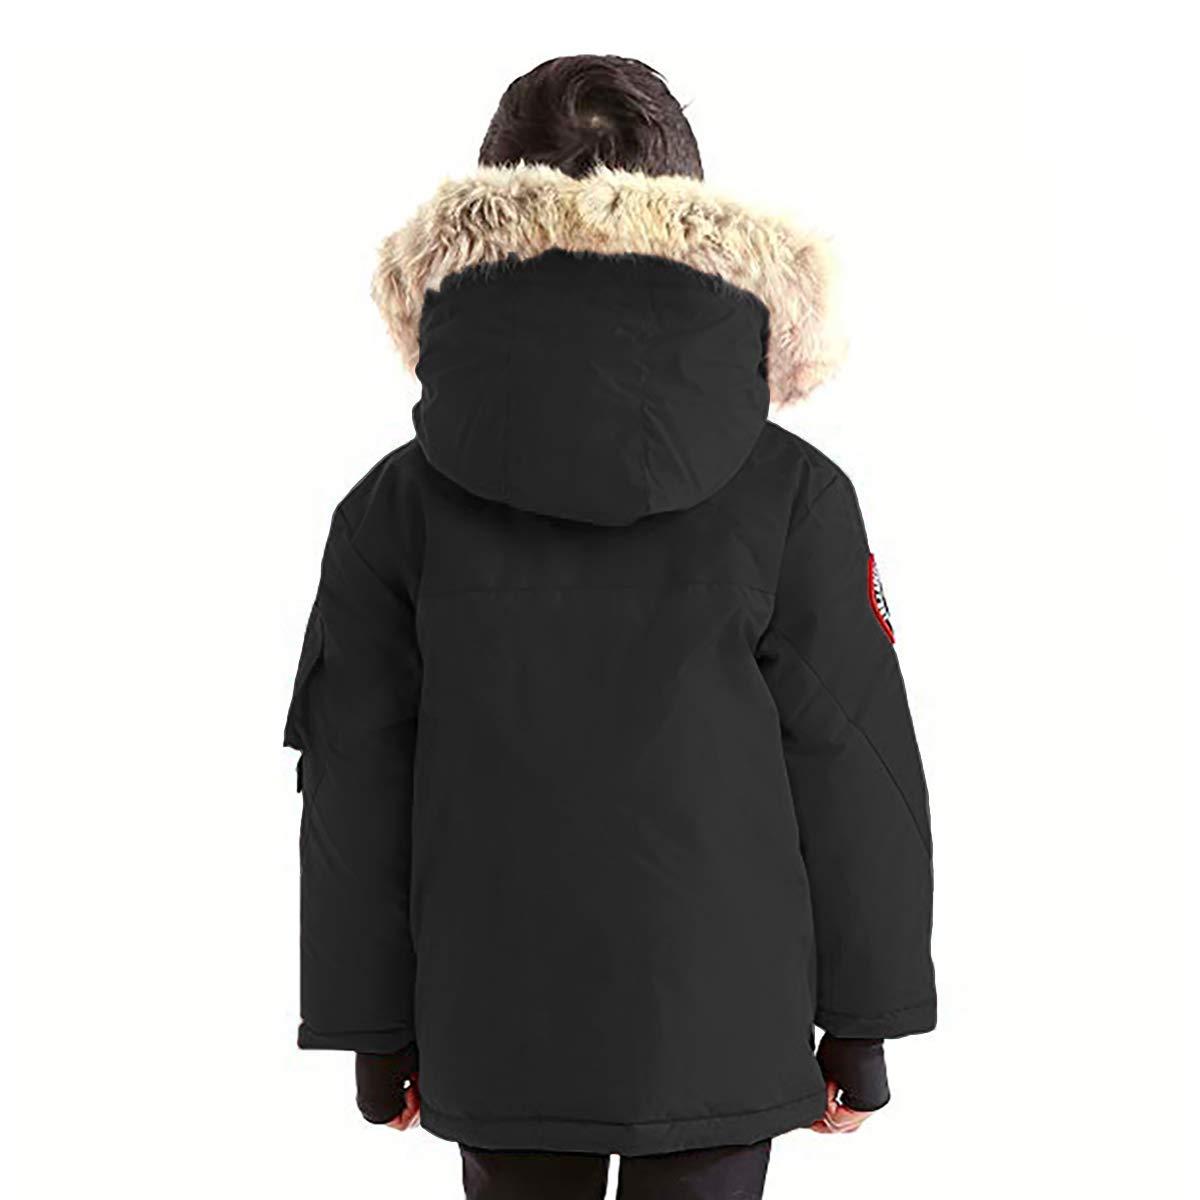 Triple F.A.T. Goose Kids Chenega Premium Down Jacket (7, Black) by Triple F.A.T. Goose (Image #3)